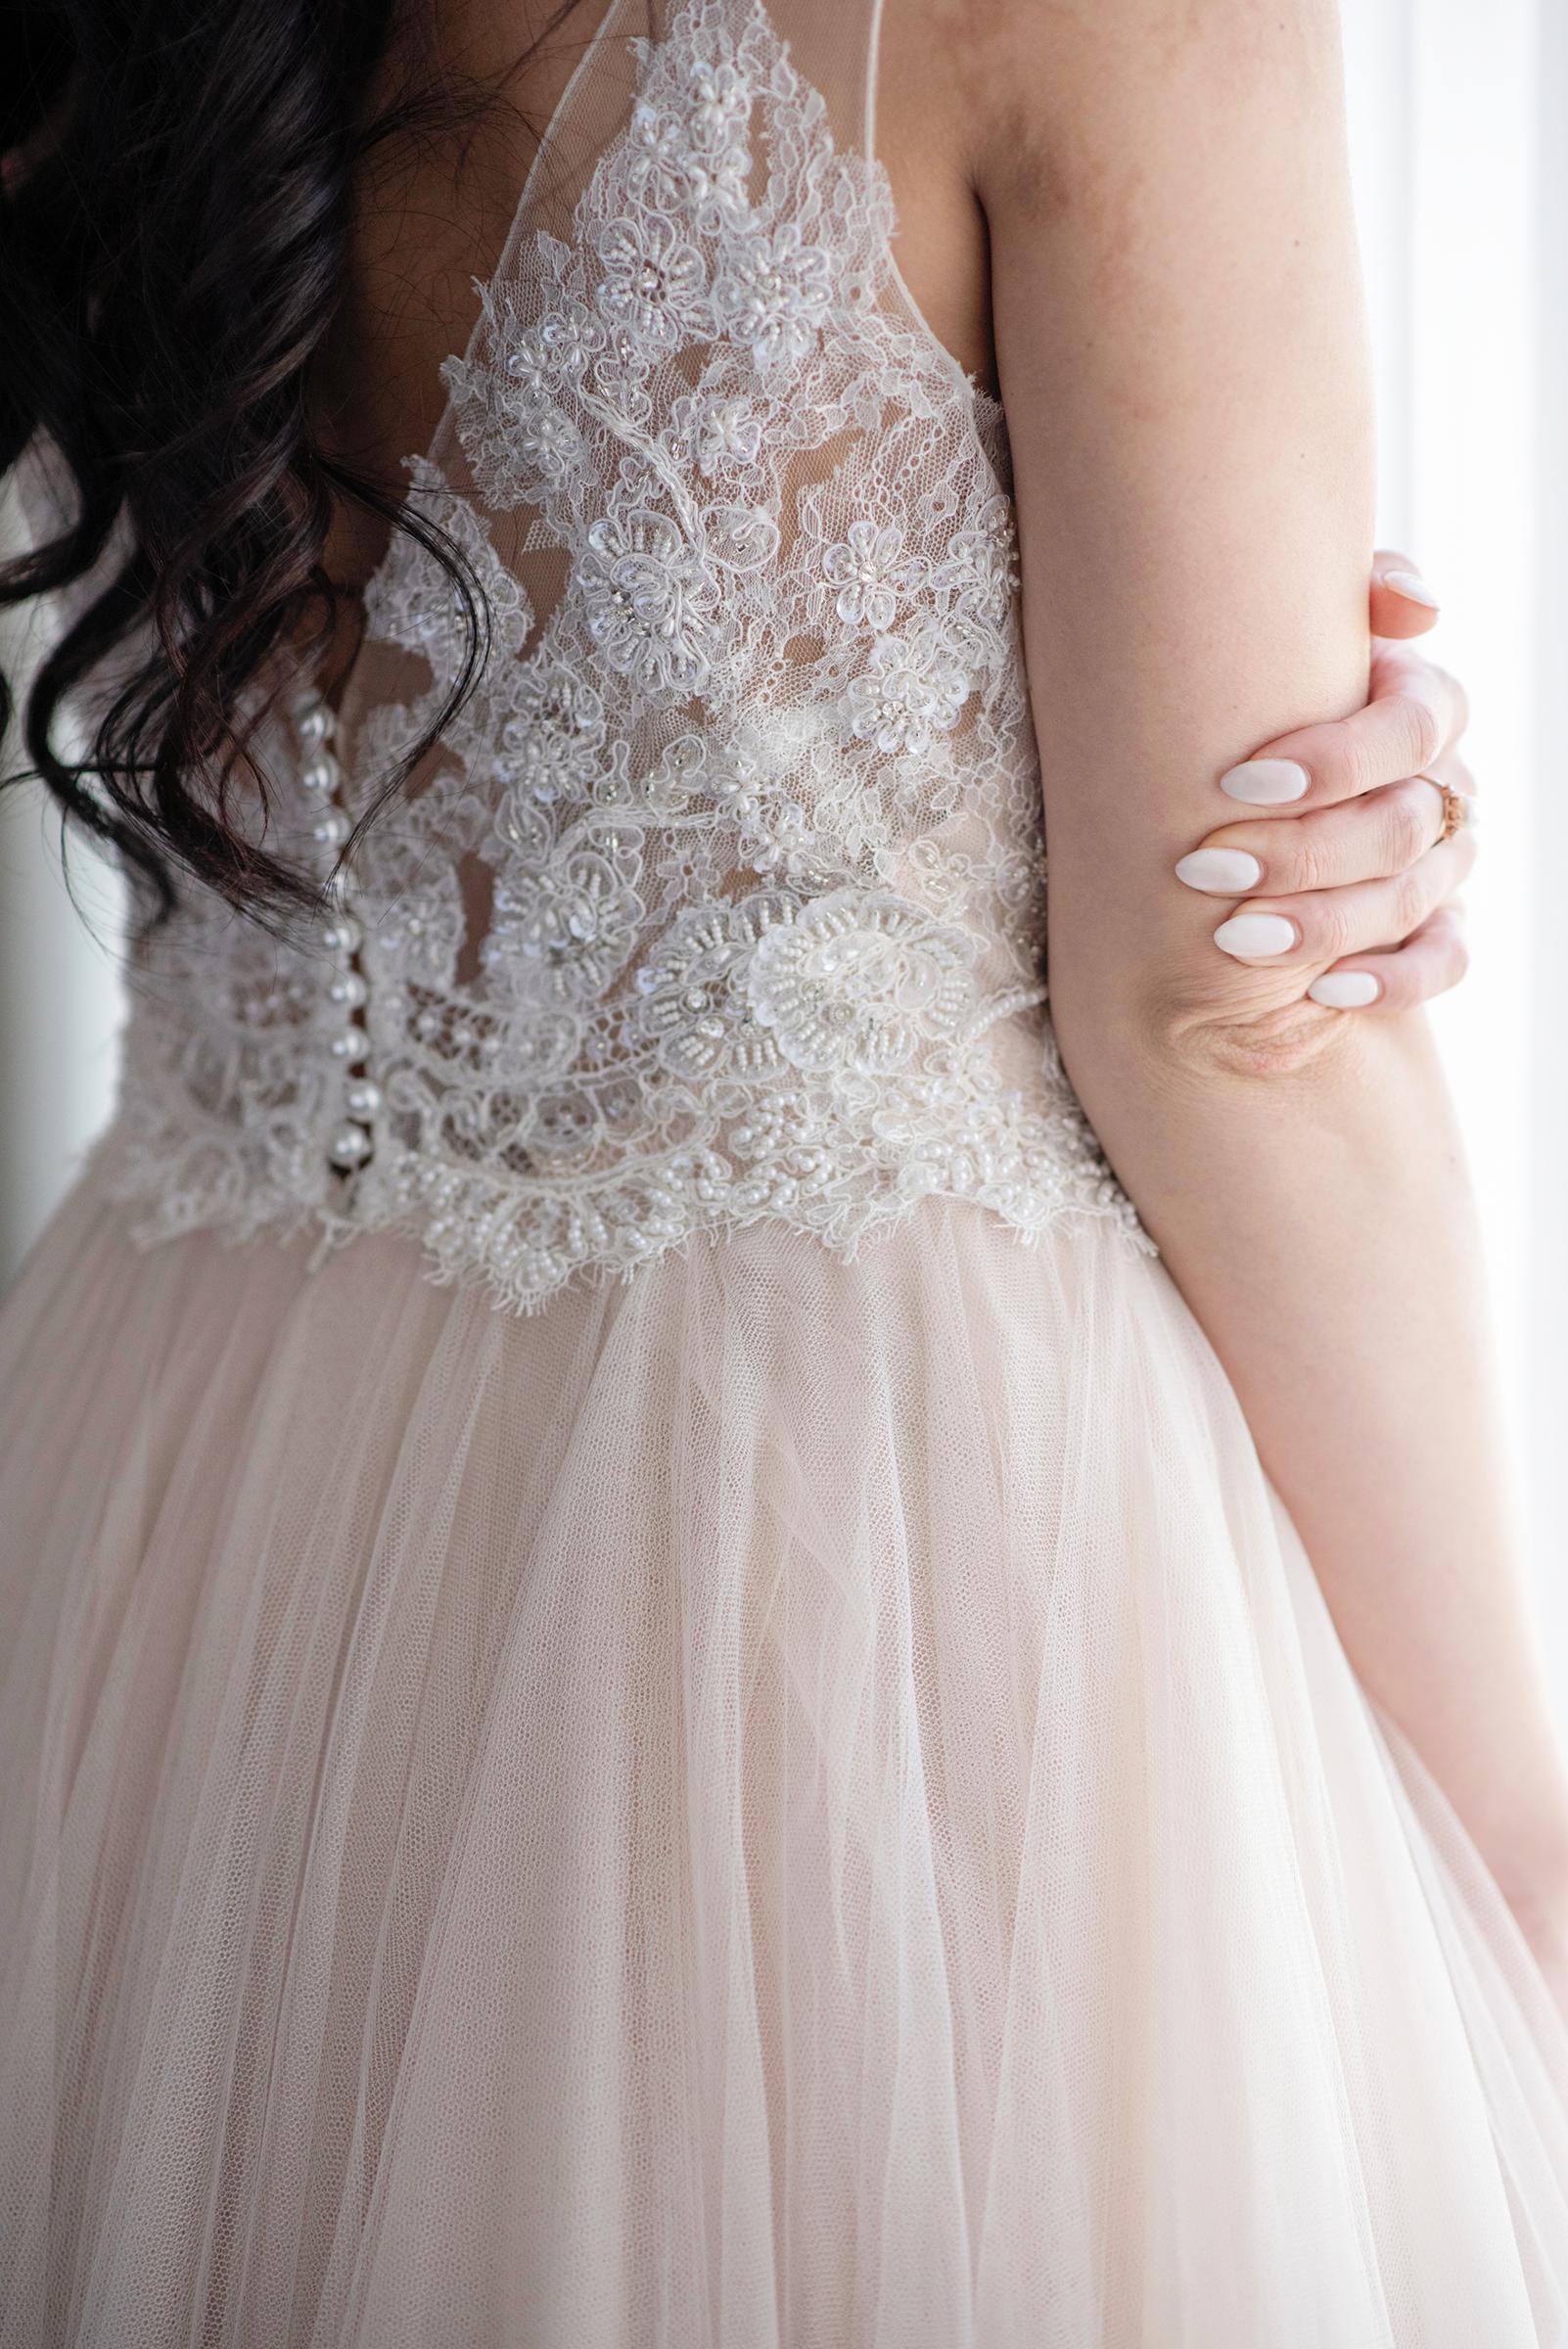 Stephanie-Second Dress Details-13.jpg